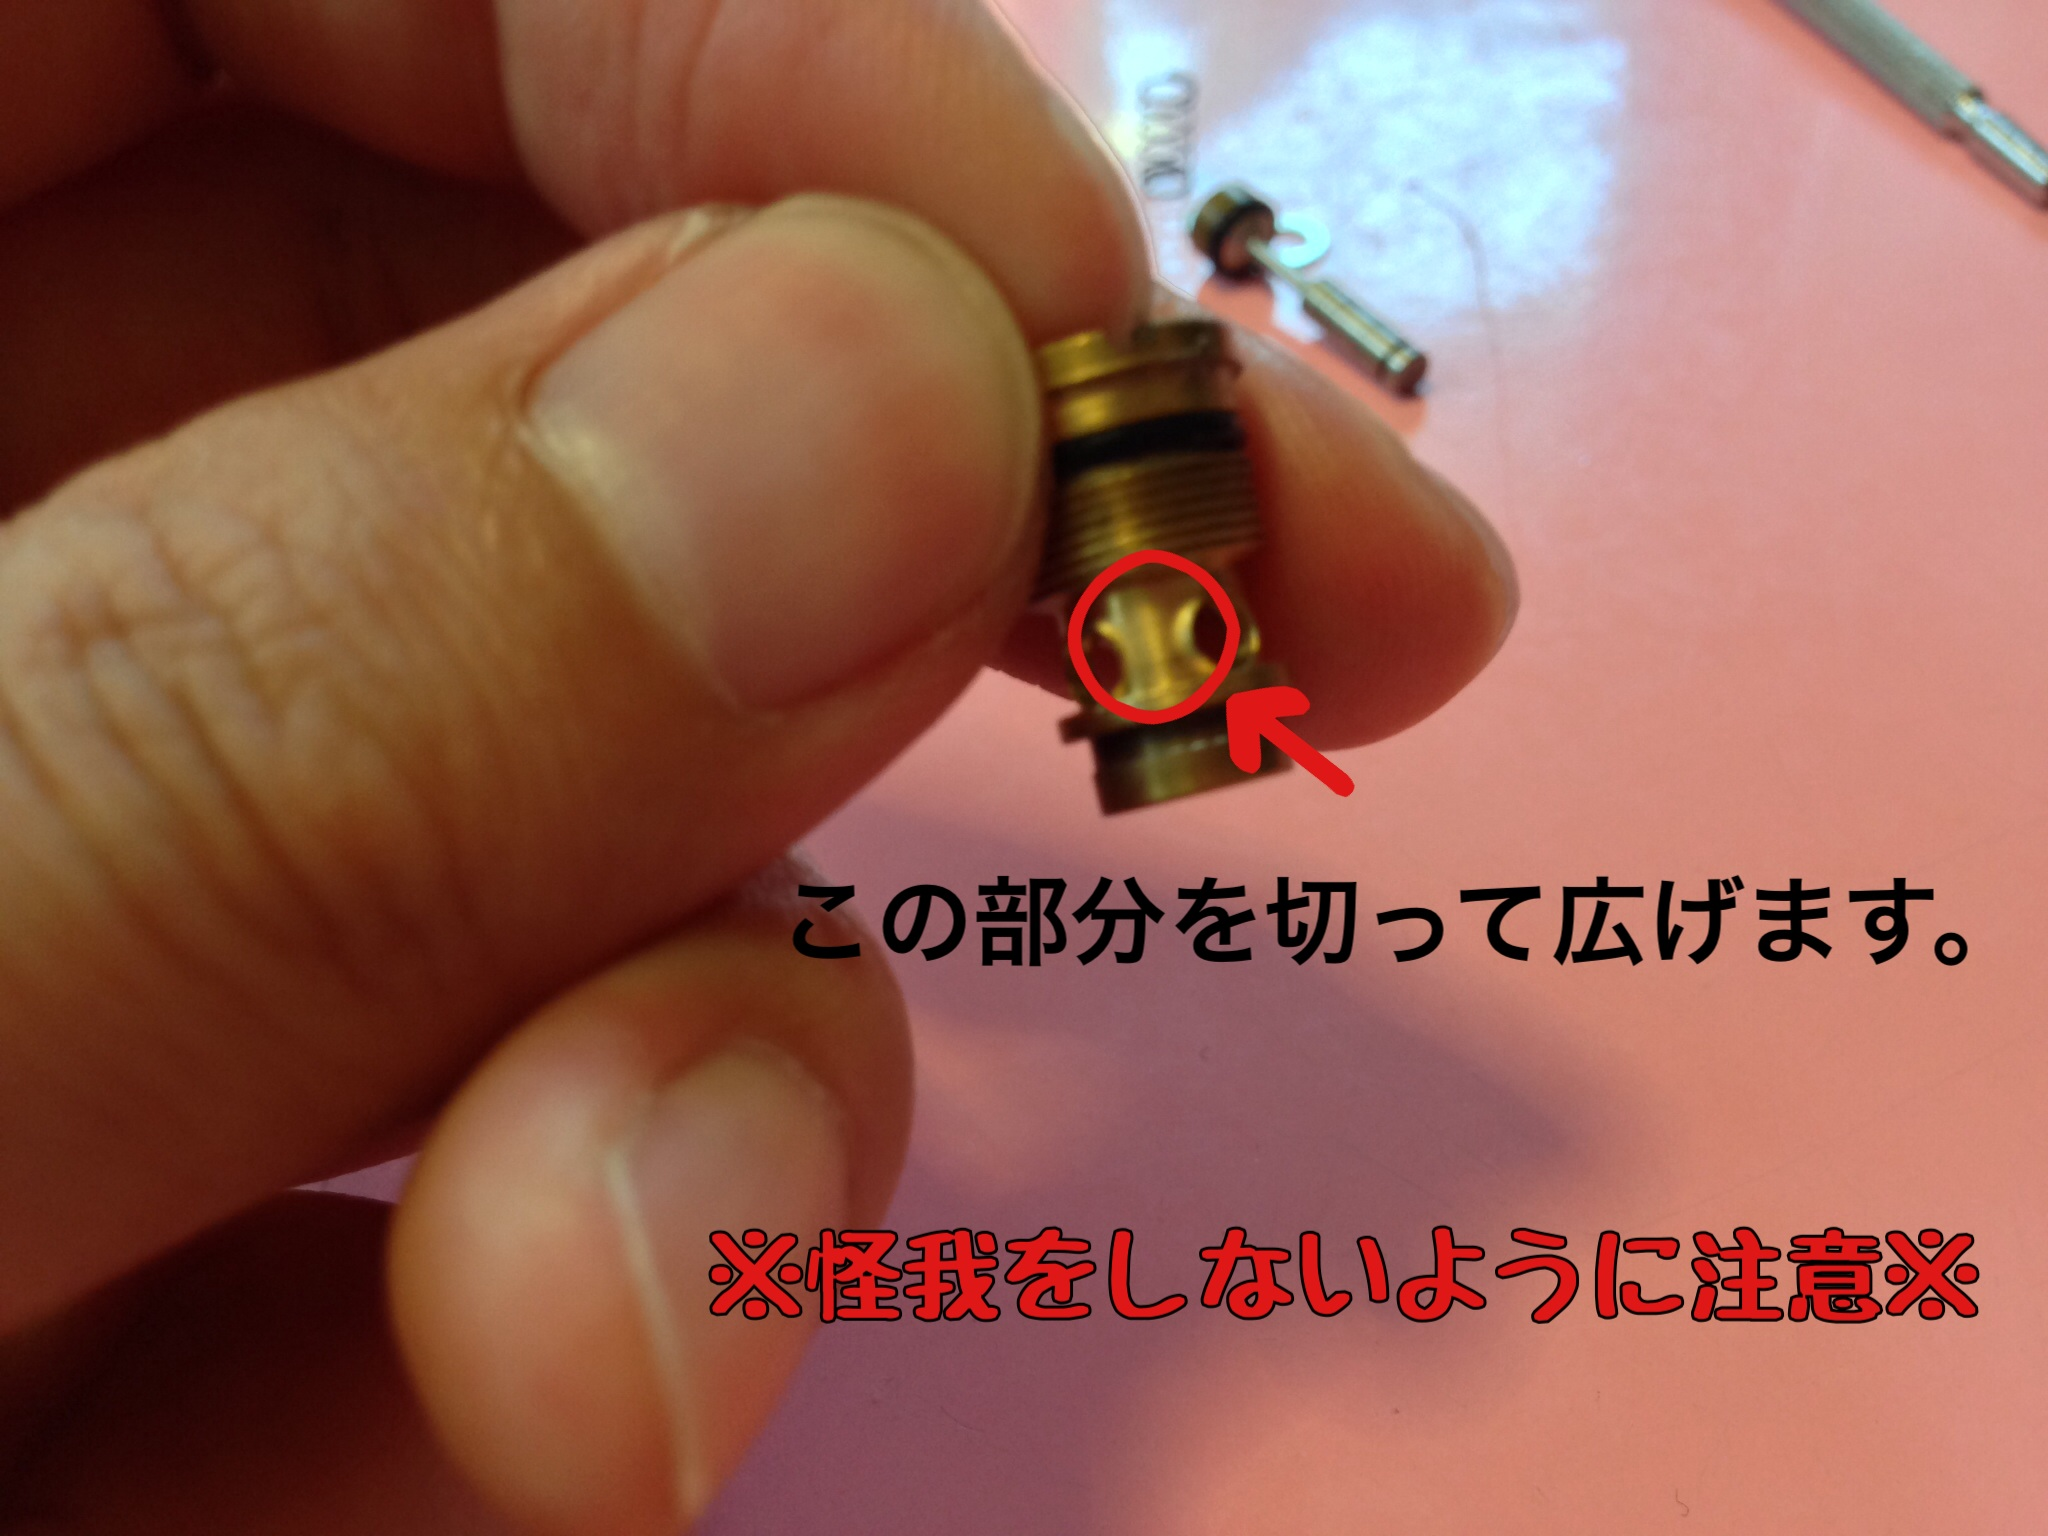 20140601173239e6c.jpg